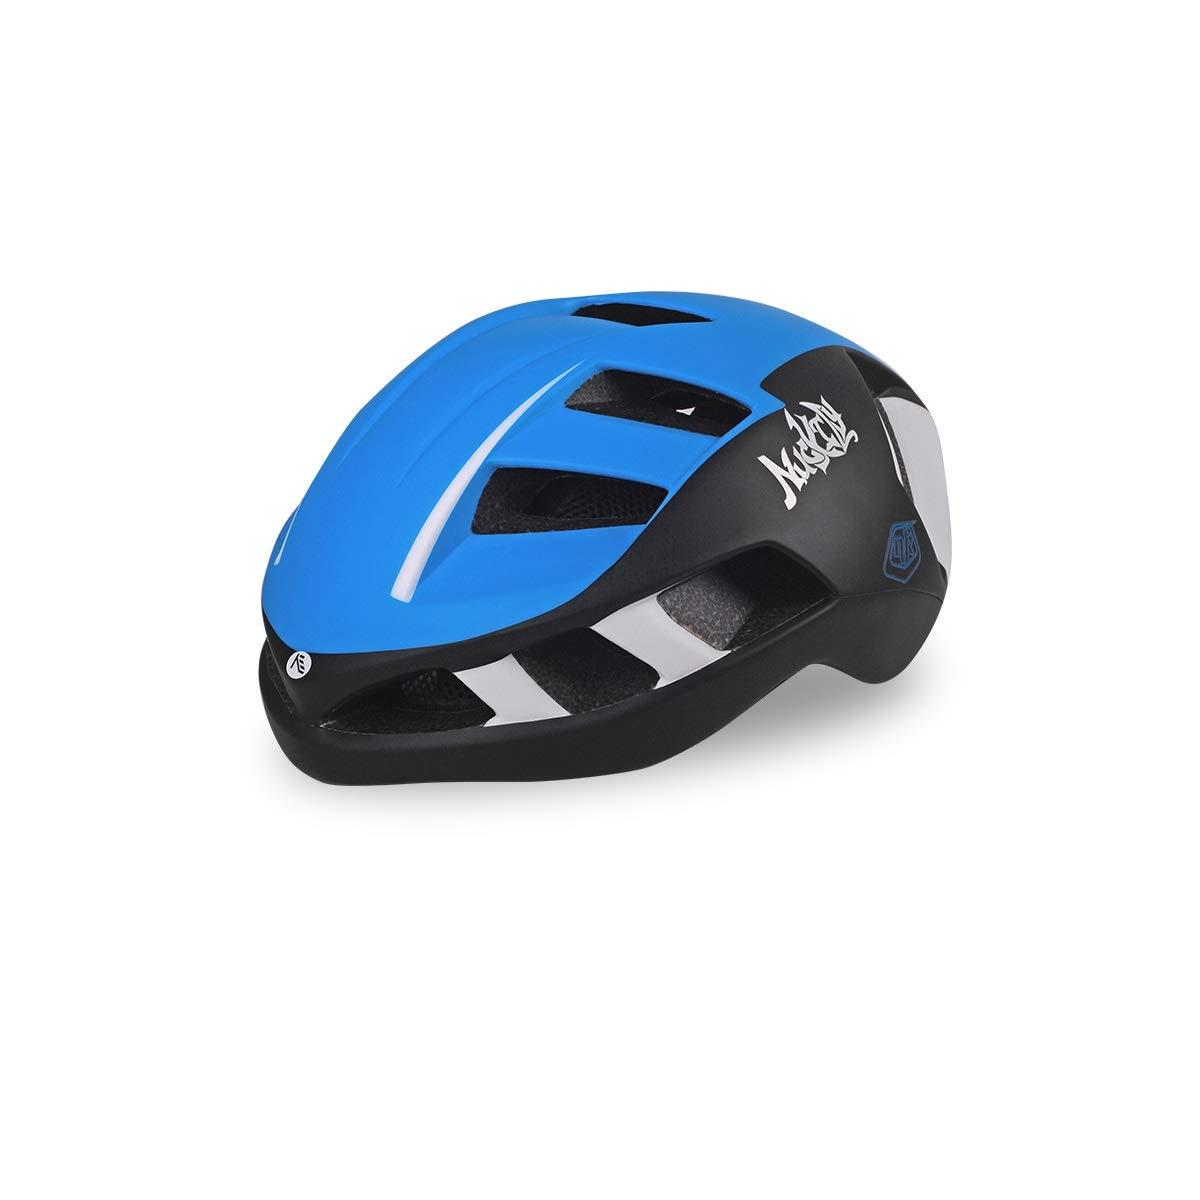 8hawoenju Bike Helmet with in-Molded Reinforcing Skeleton for Added Protection - Adult Size, Comfortable, Lightweight, Breathable (Color : Blue, Size : L)